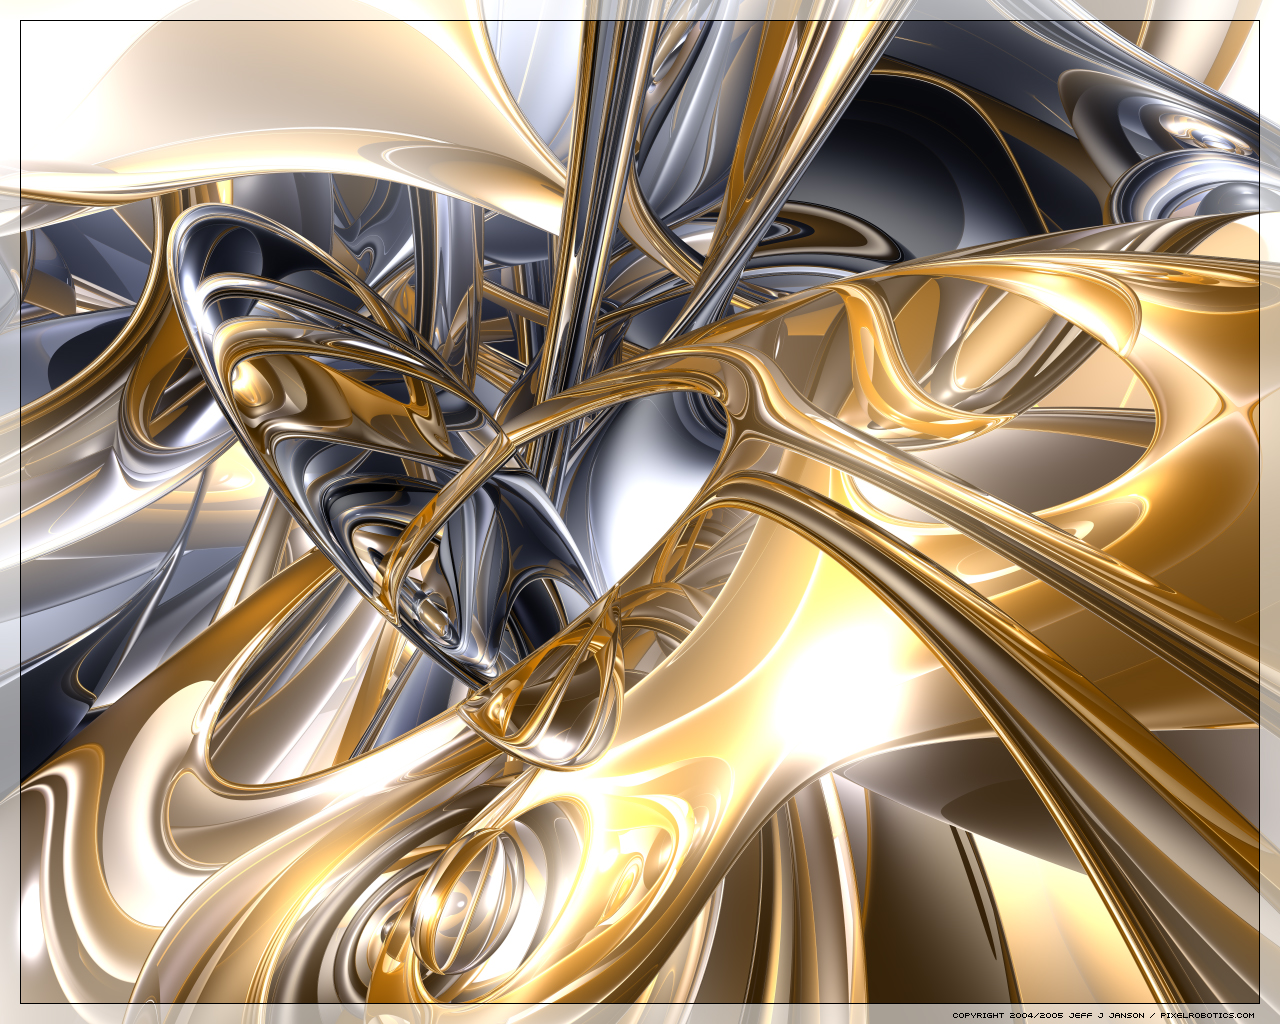 Silver and Gold Wallpaper - WallpaperSafari